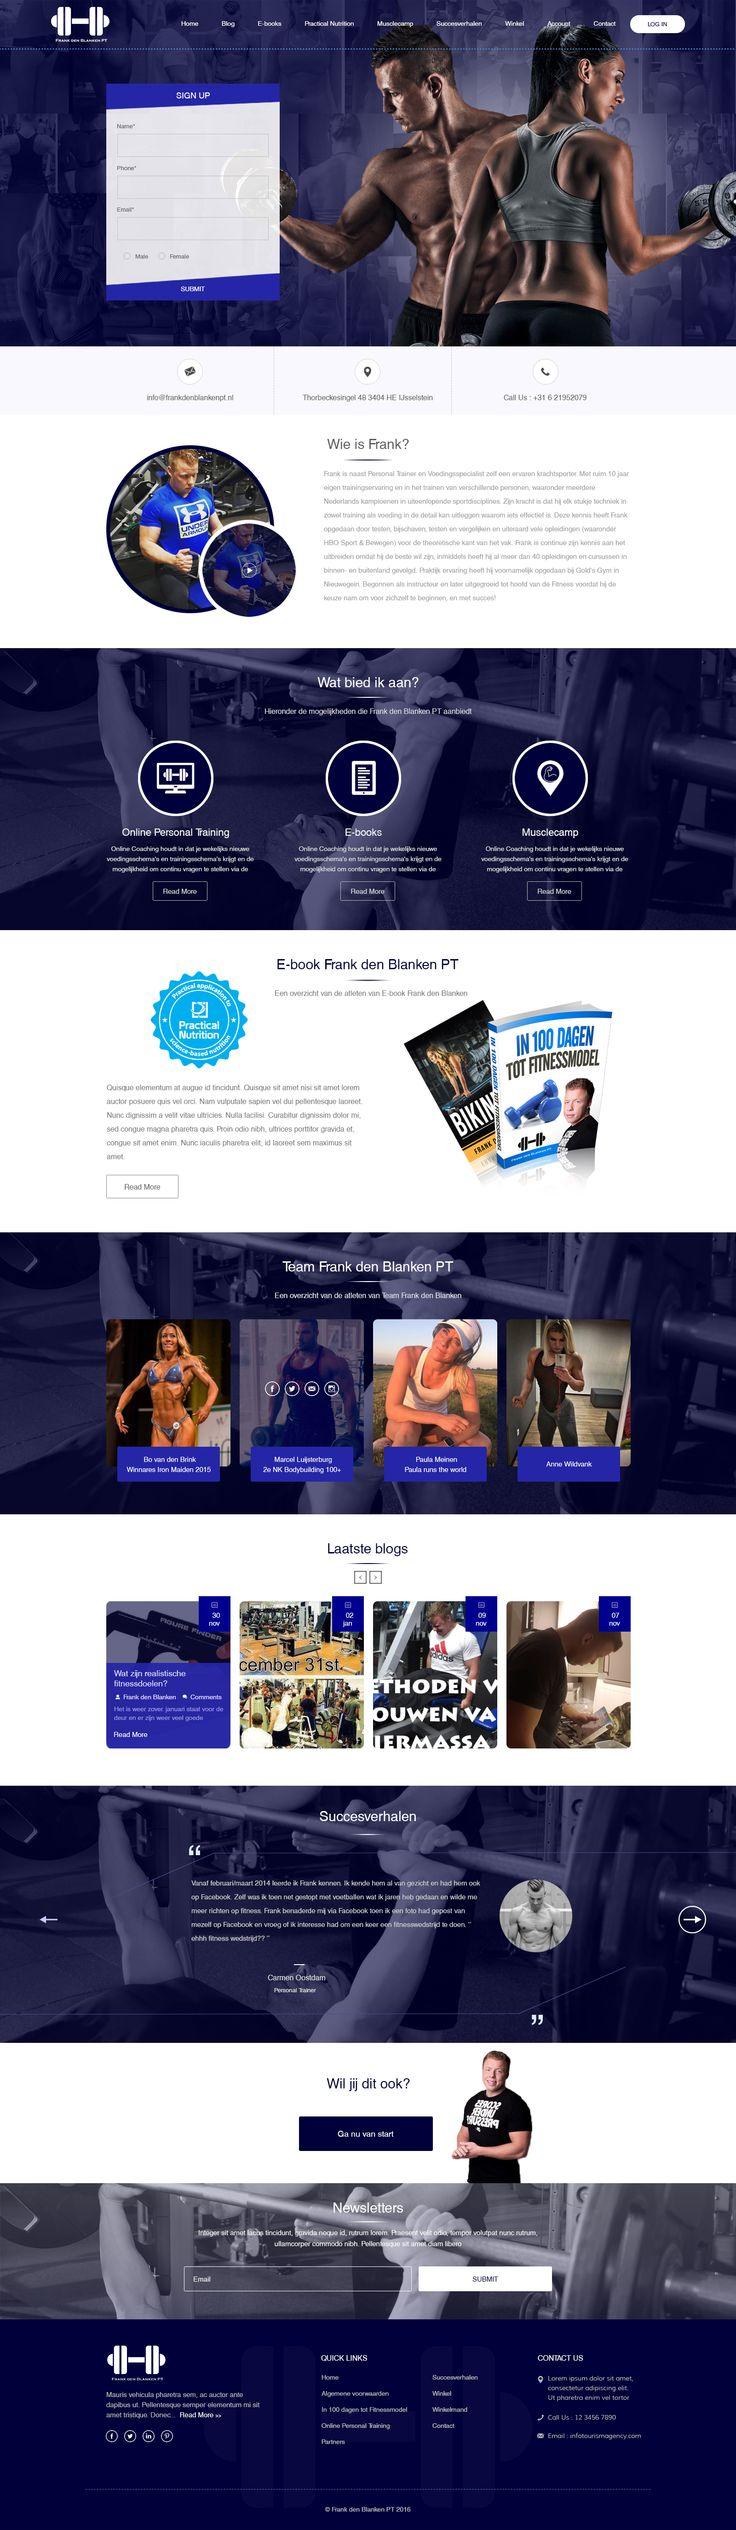 A body builder's website design created by Digilife Solution (http://www.digilifesolution.com)